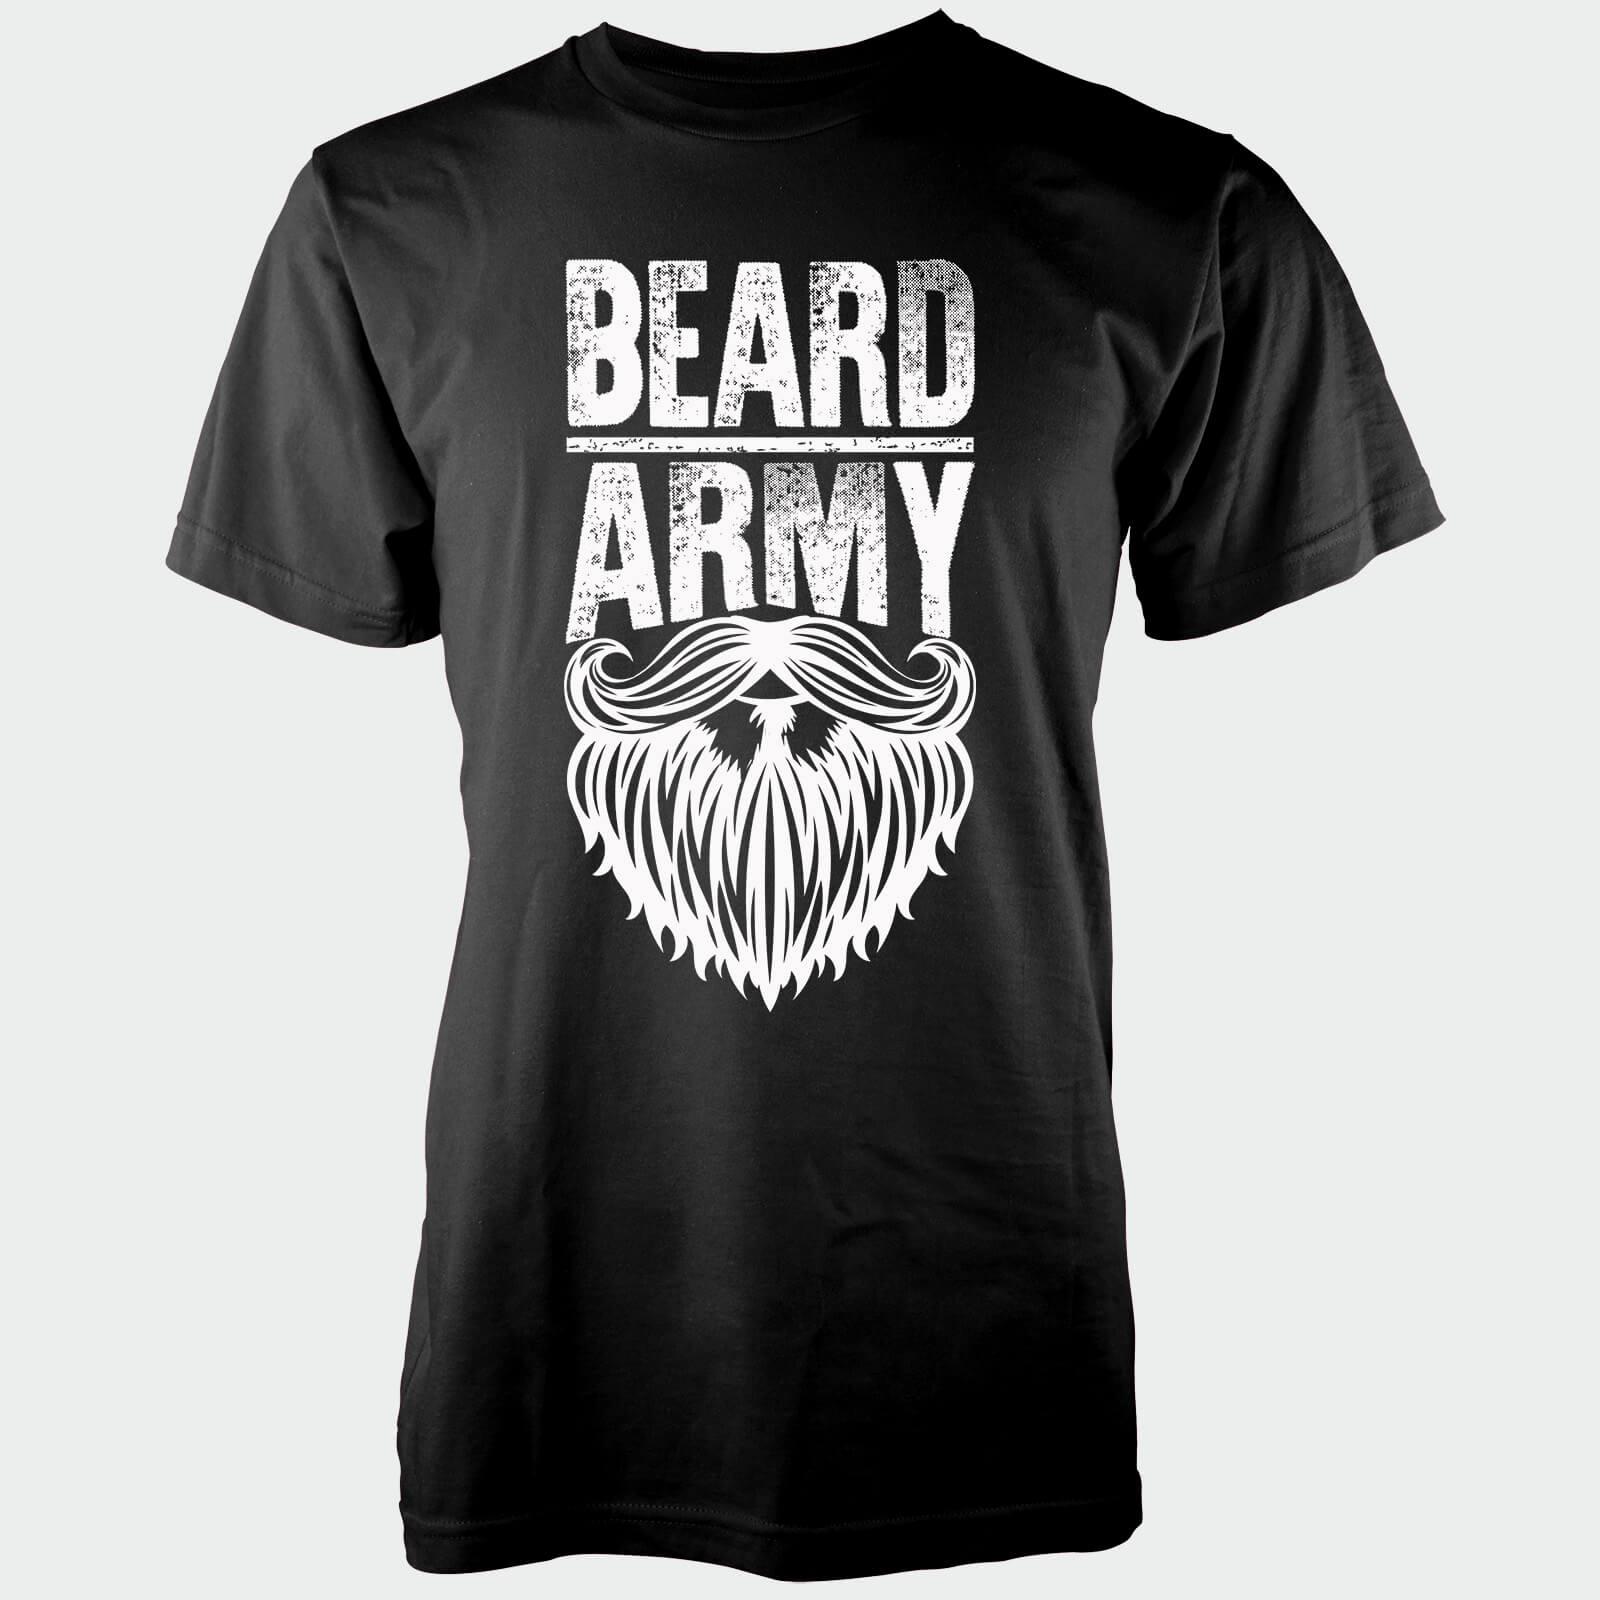 Beard Army Men s Black Insignia T-Shirt  ef99aaf0cd3